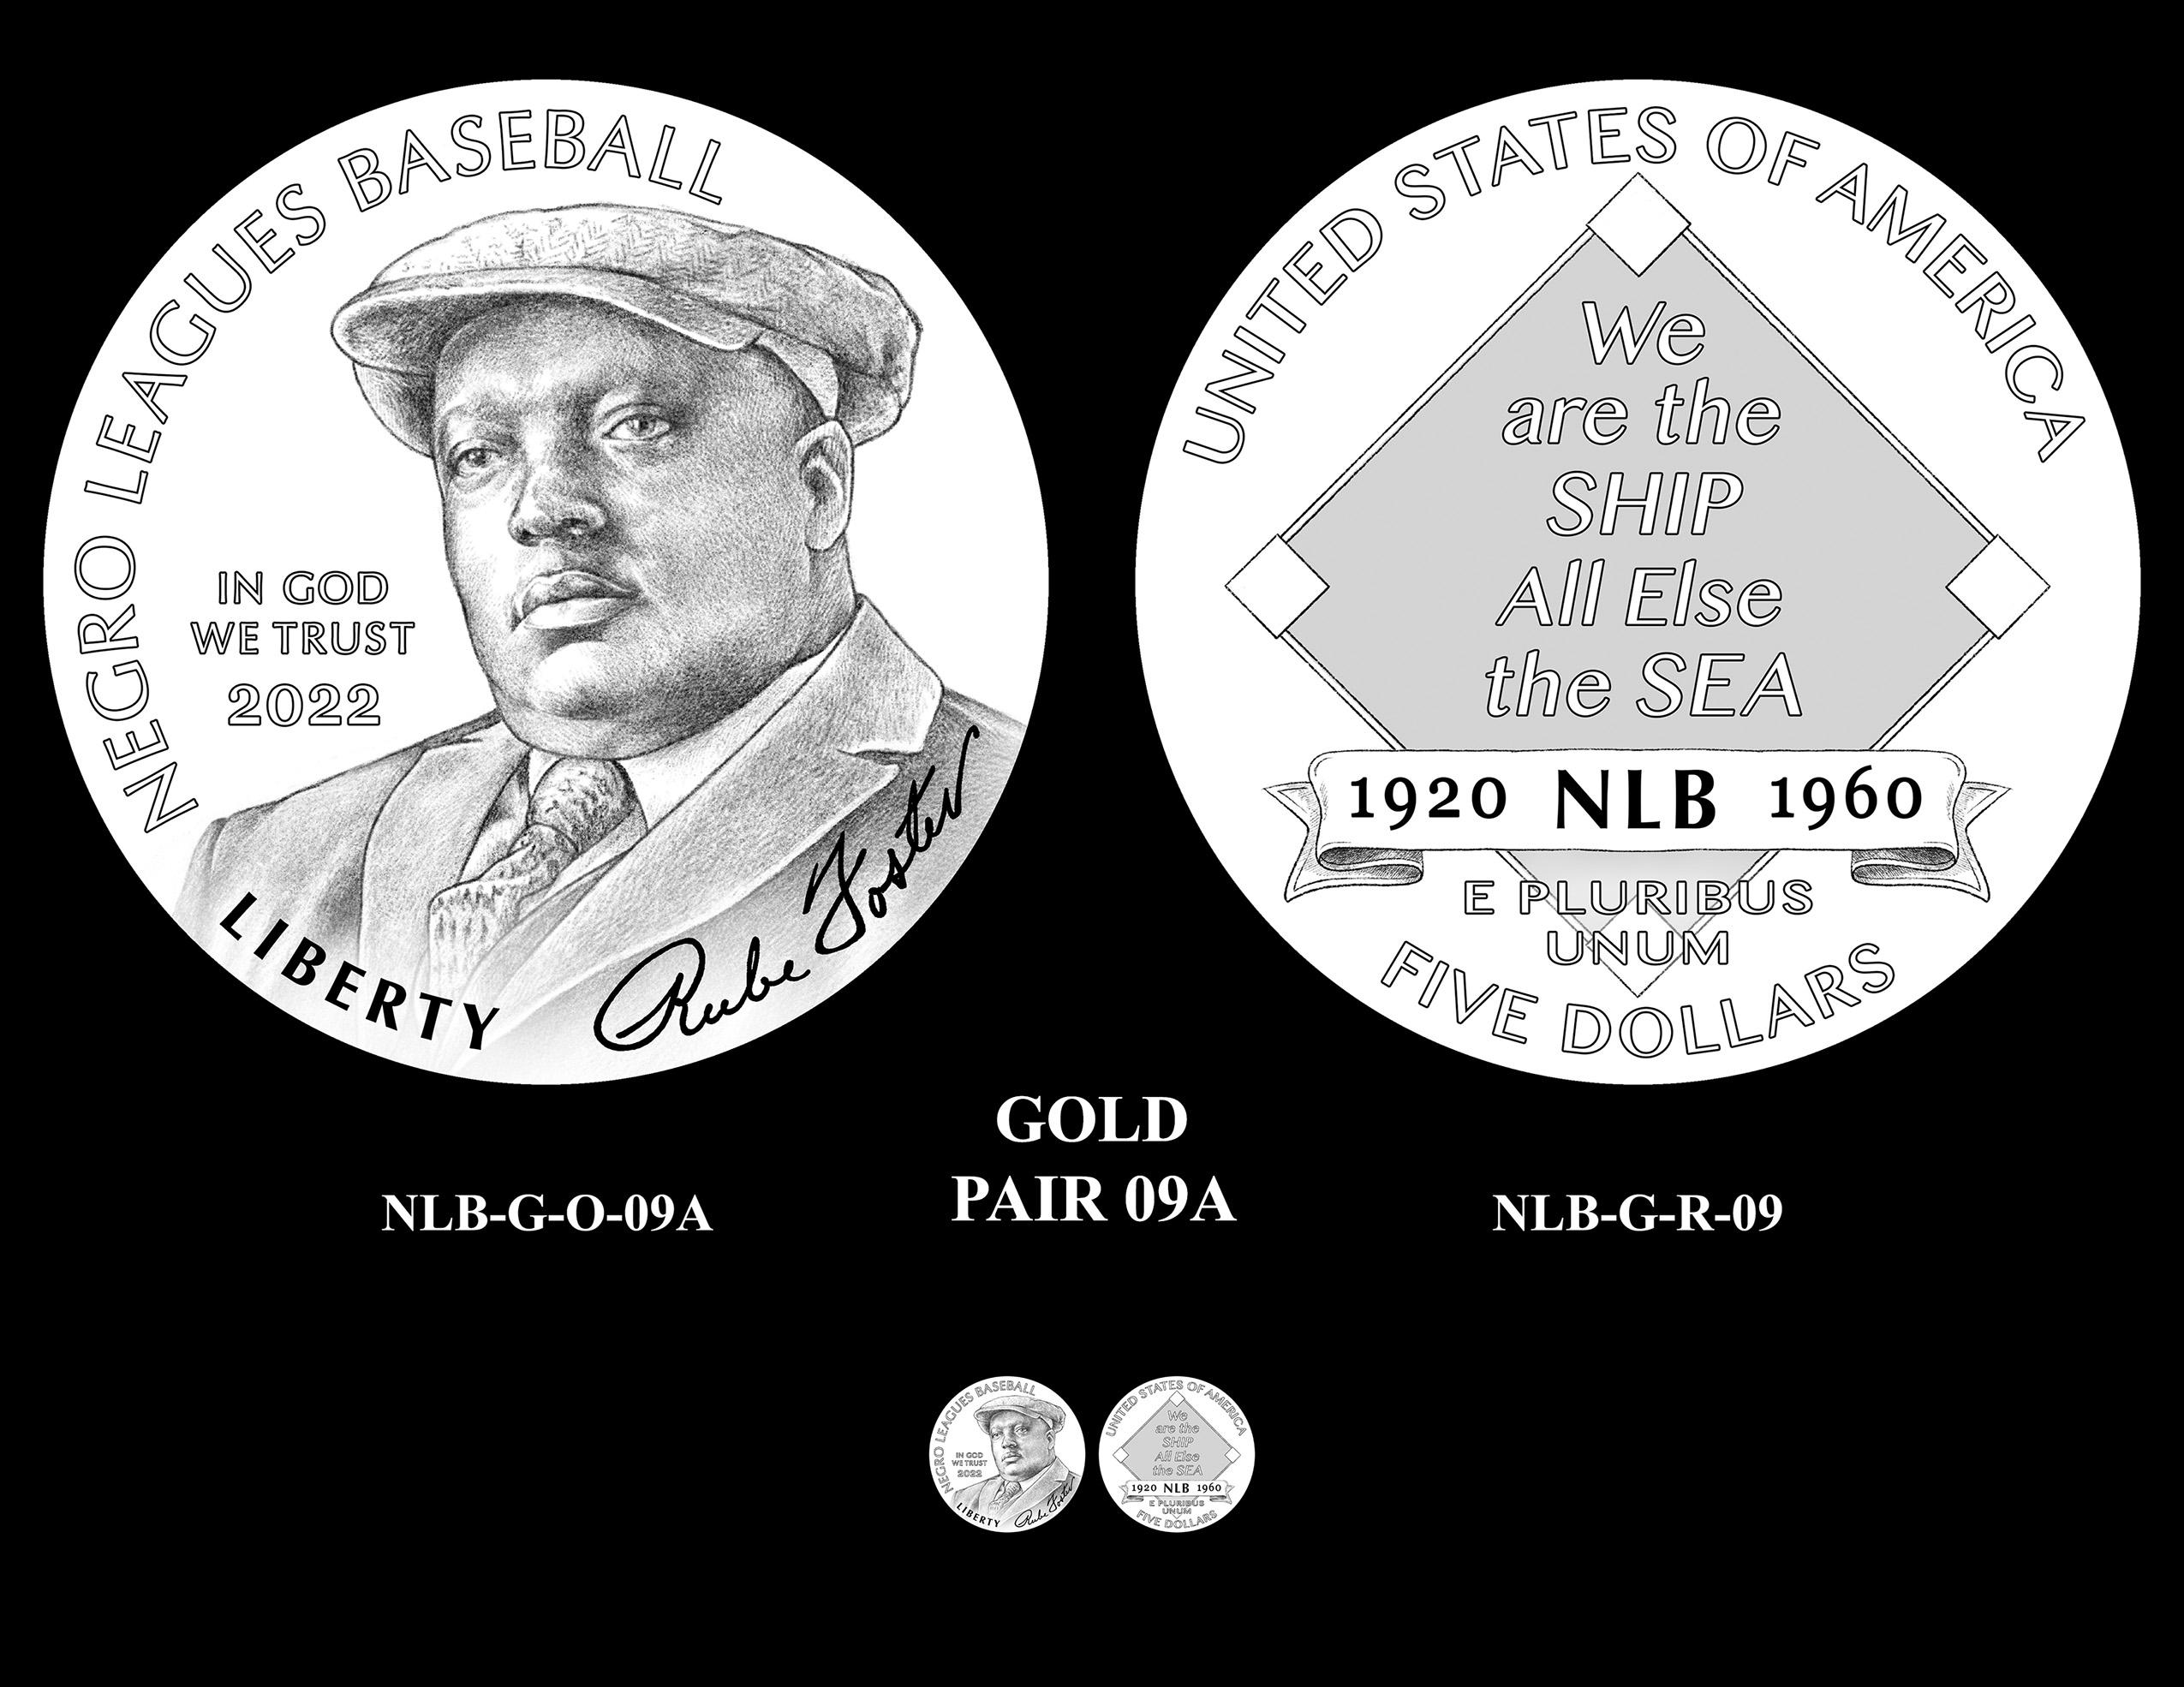 Gold Pair 9A -- Negro Leagues Baseball Commemorative Coin Program